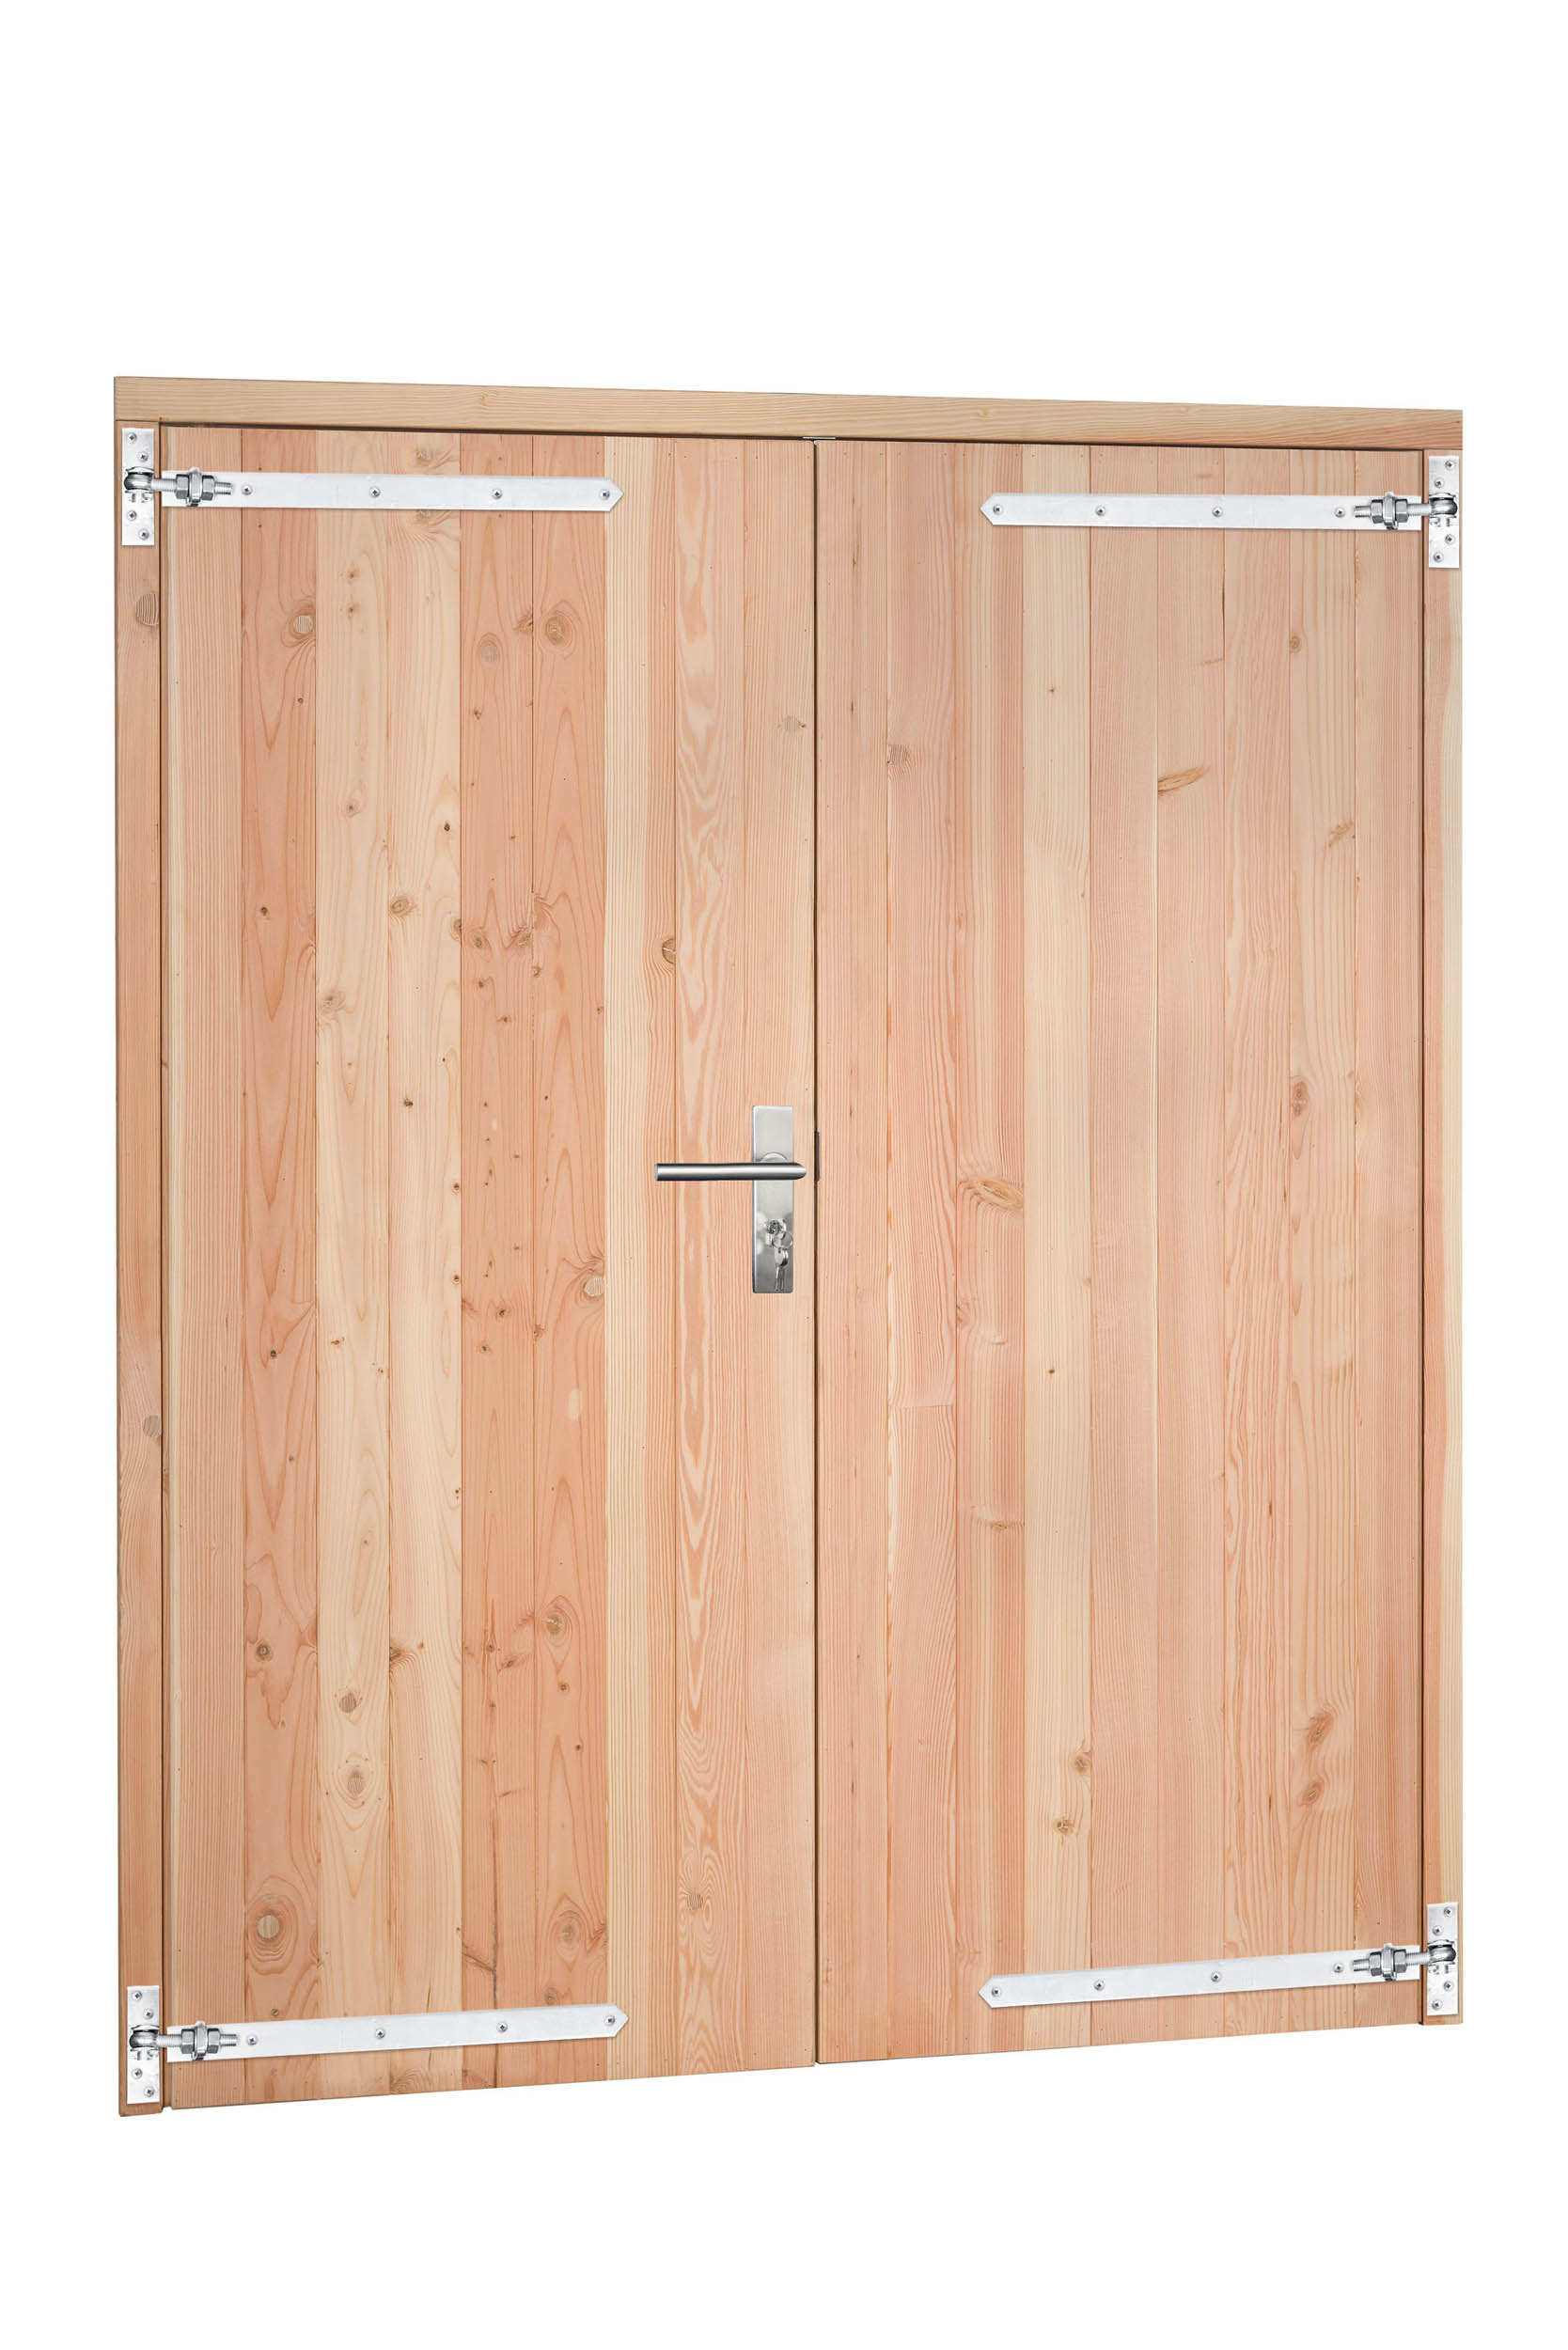 Hillhout Douglas enkele deur incl. kozijn, afm. 168 x 201 cm. - onbehandeld (blank) douglas